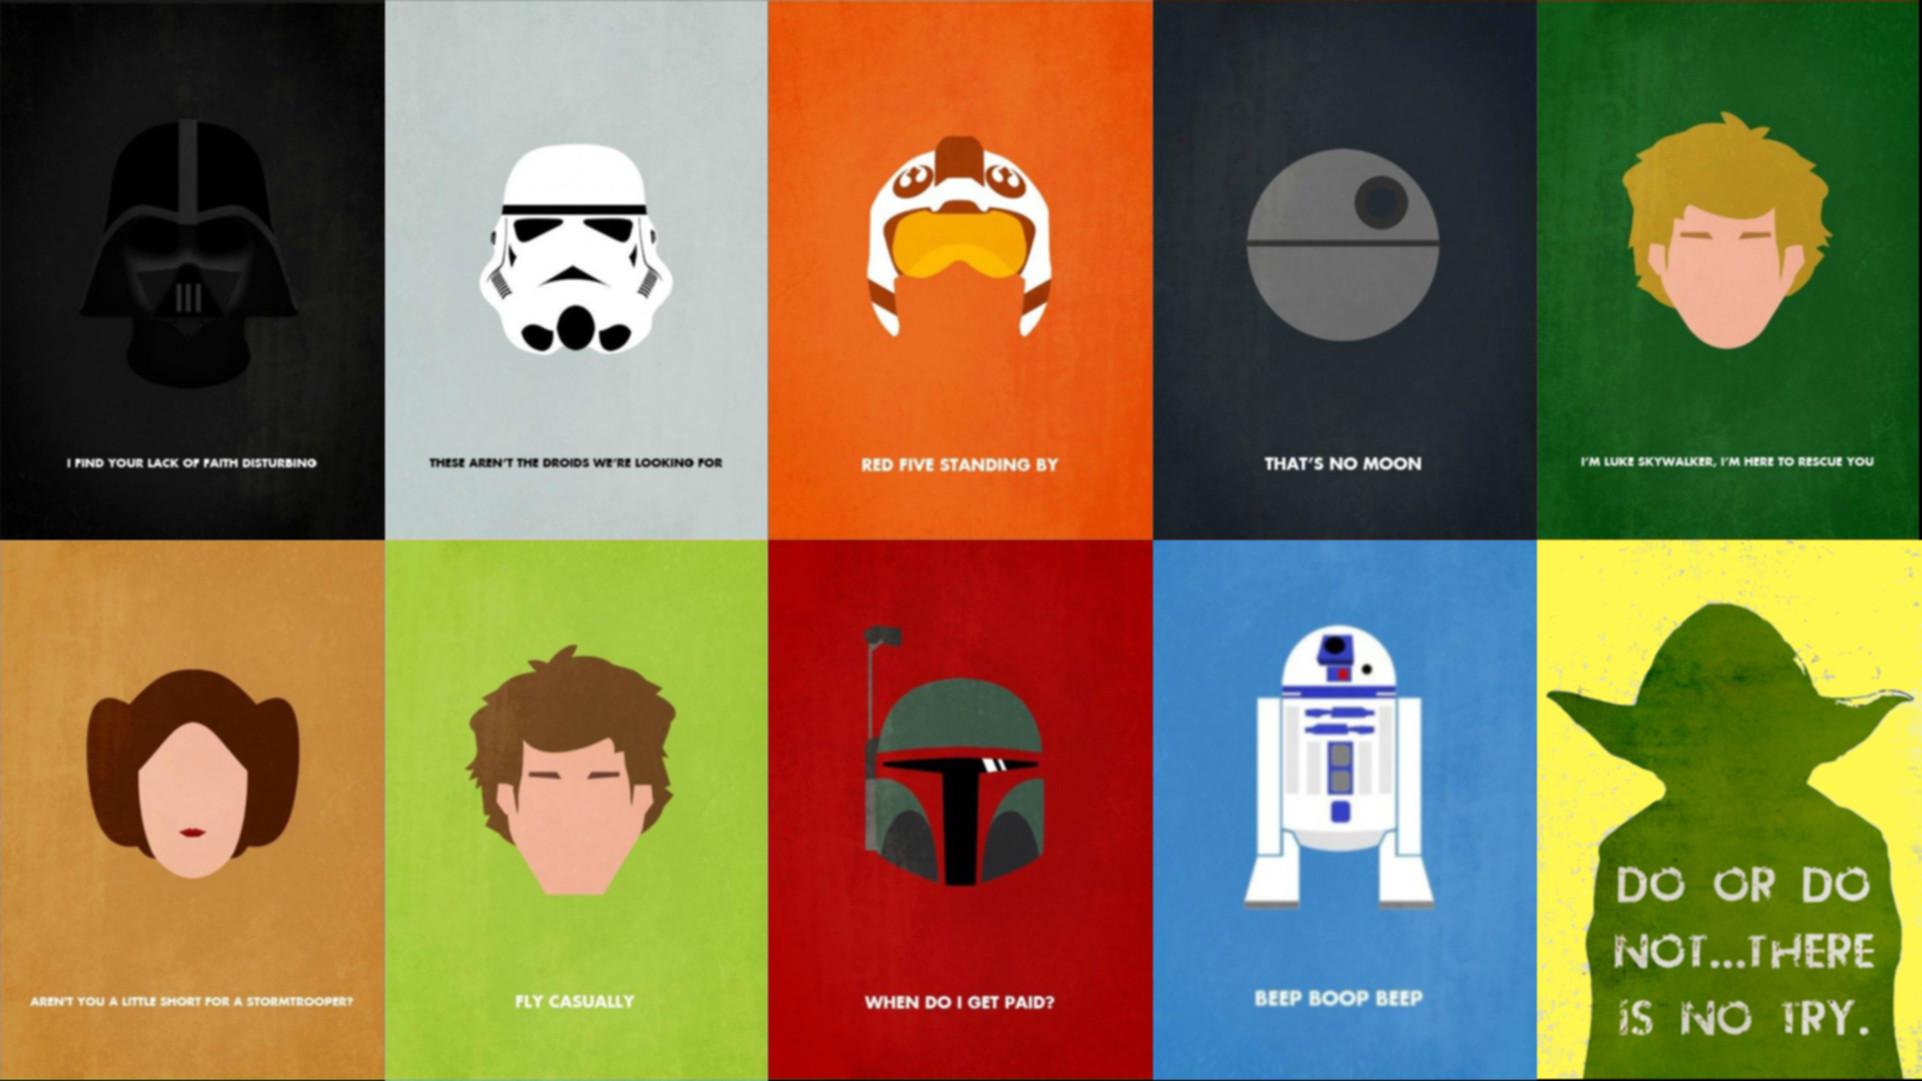 Data Src Amazing Funny Star Wars Wallpaper Star Wars Quote Backgrounds 1922x1081 Wallpaper Teahub Io